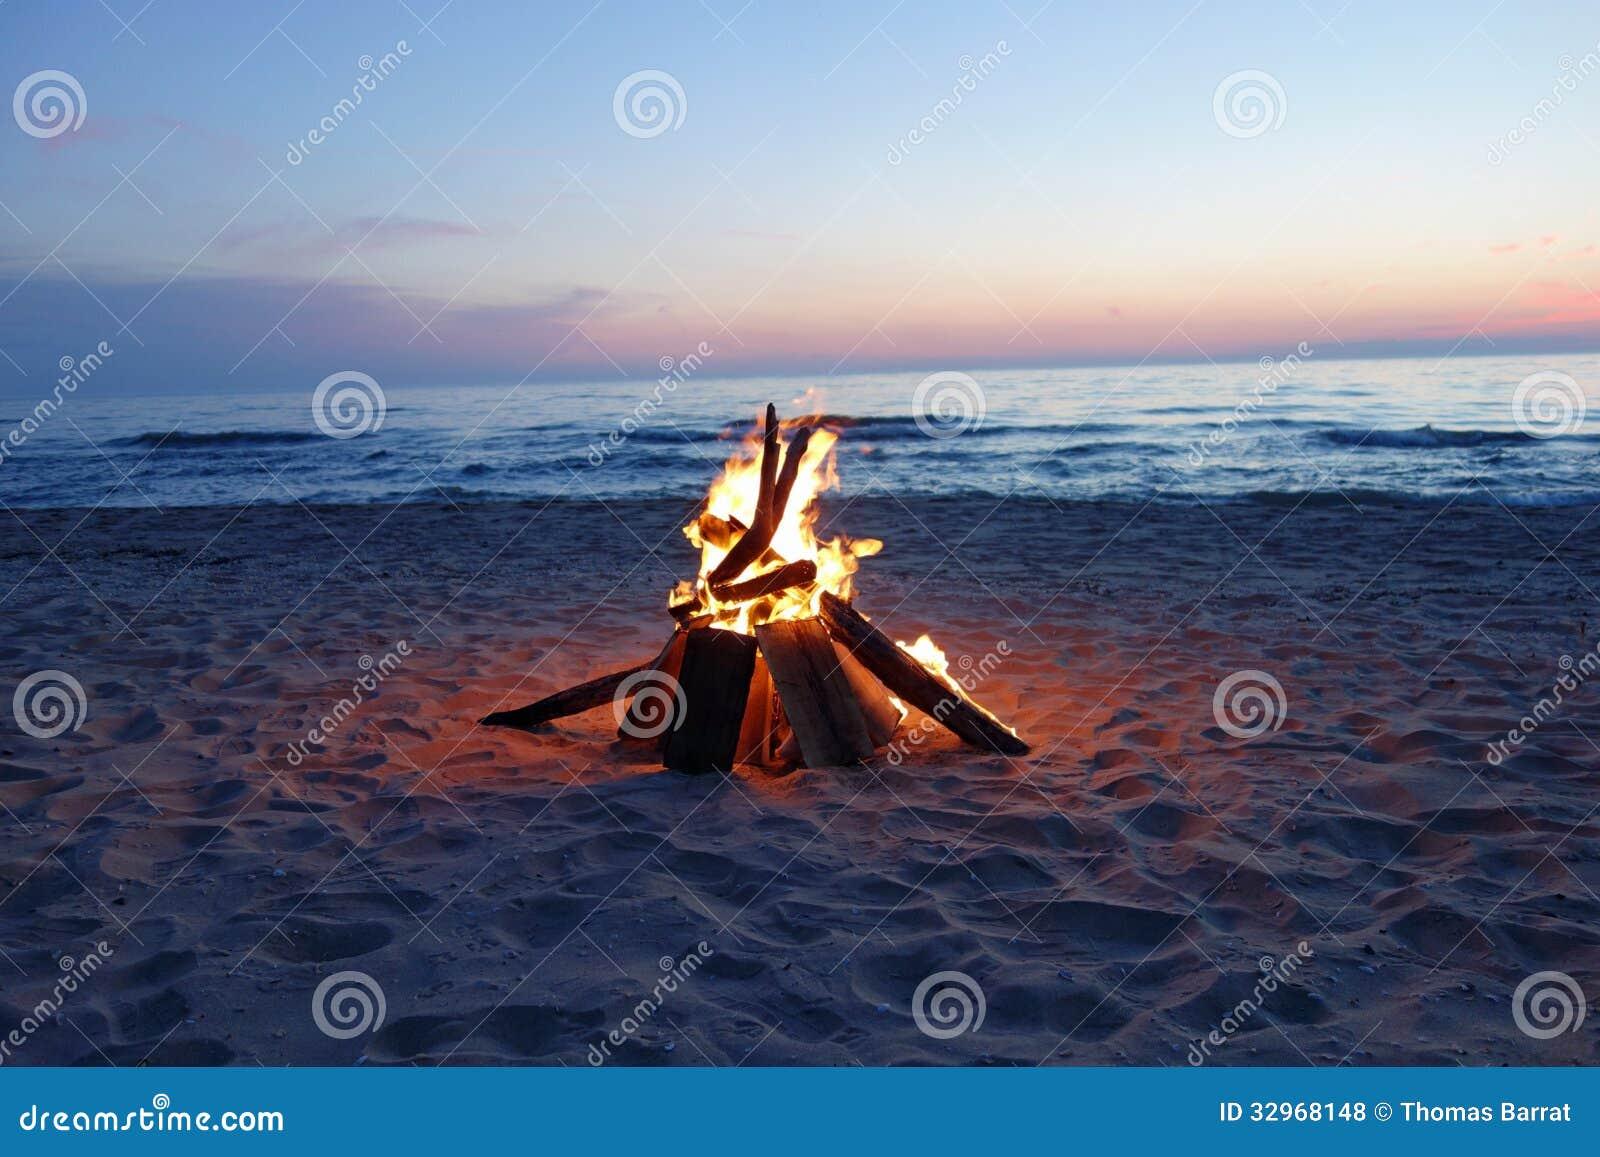 campfire on the beach stock photo. image of roast, marshmallows